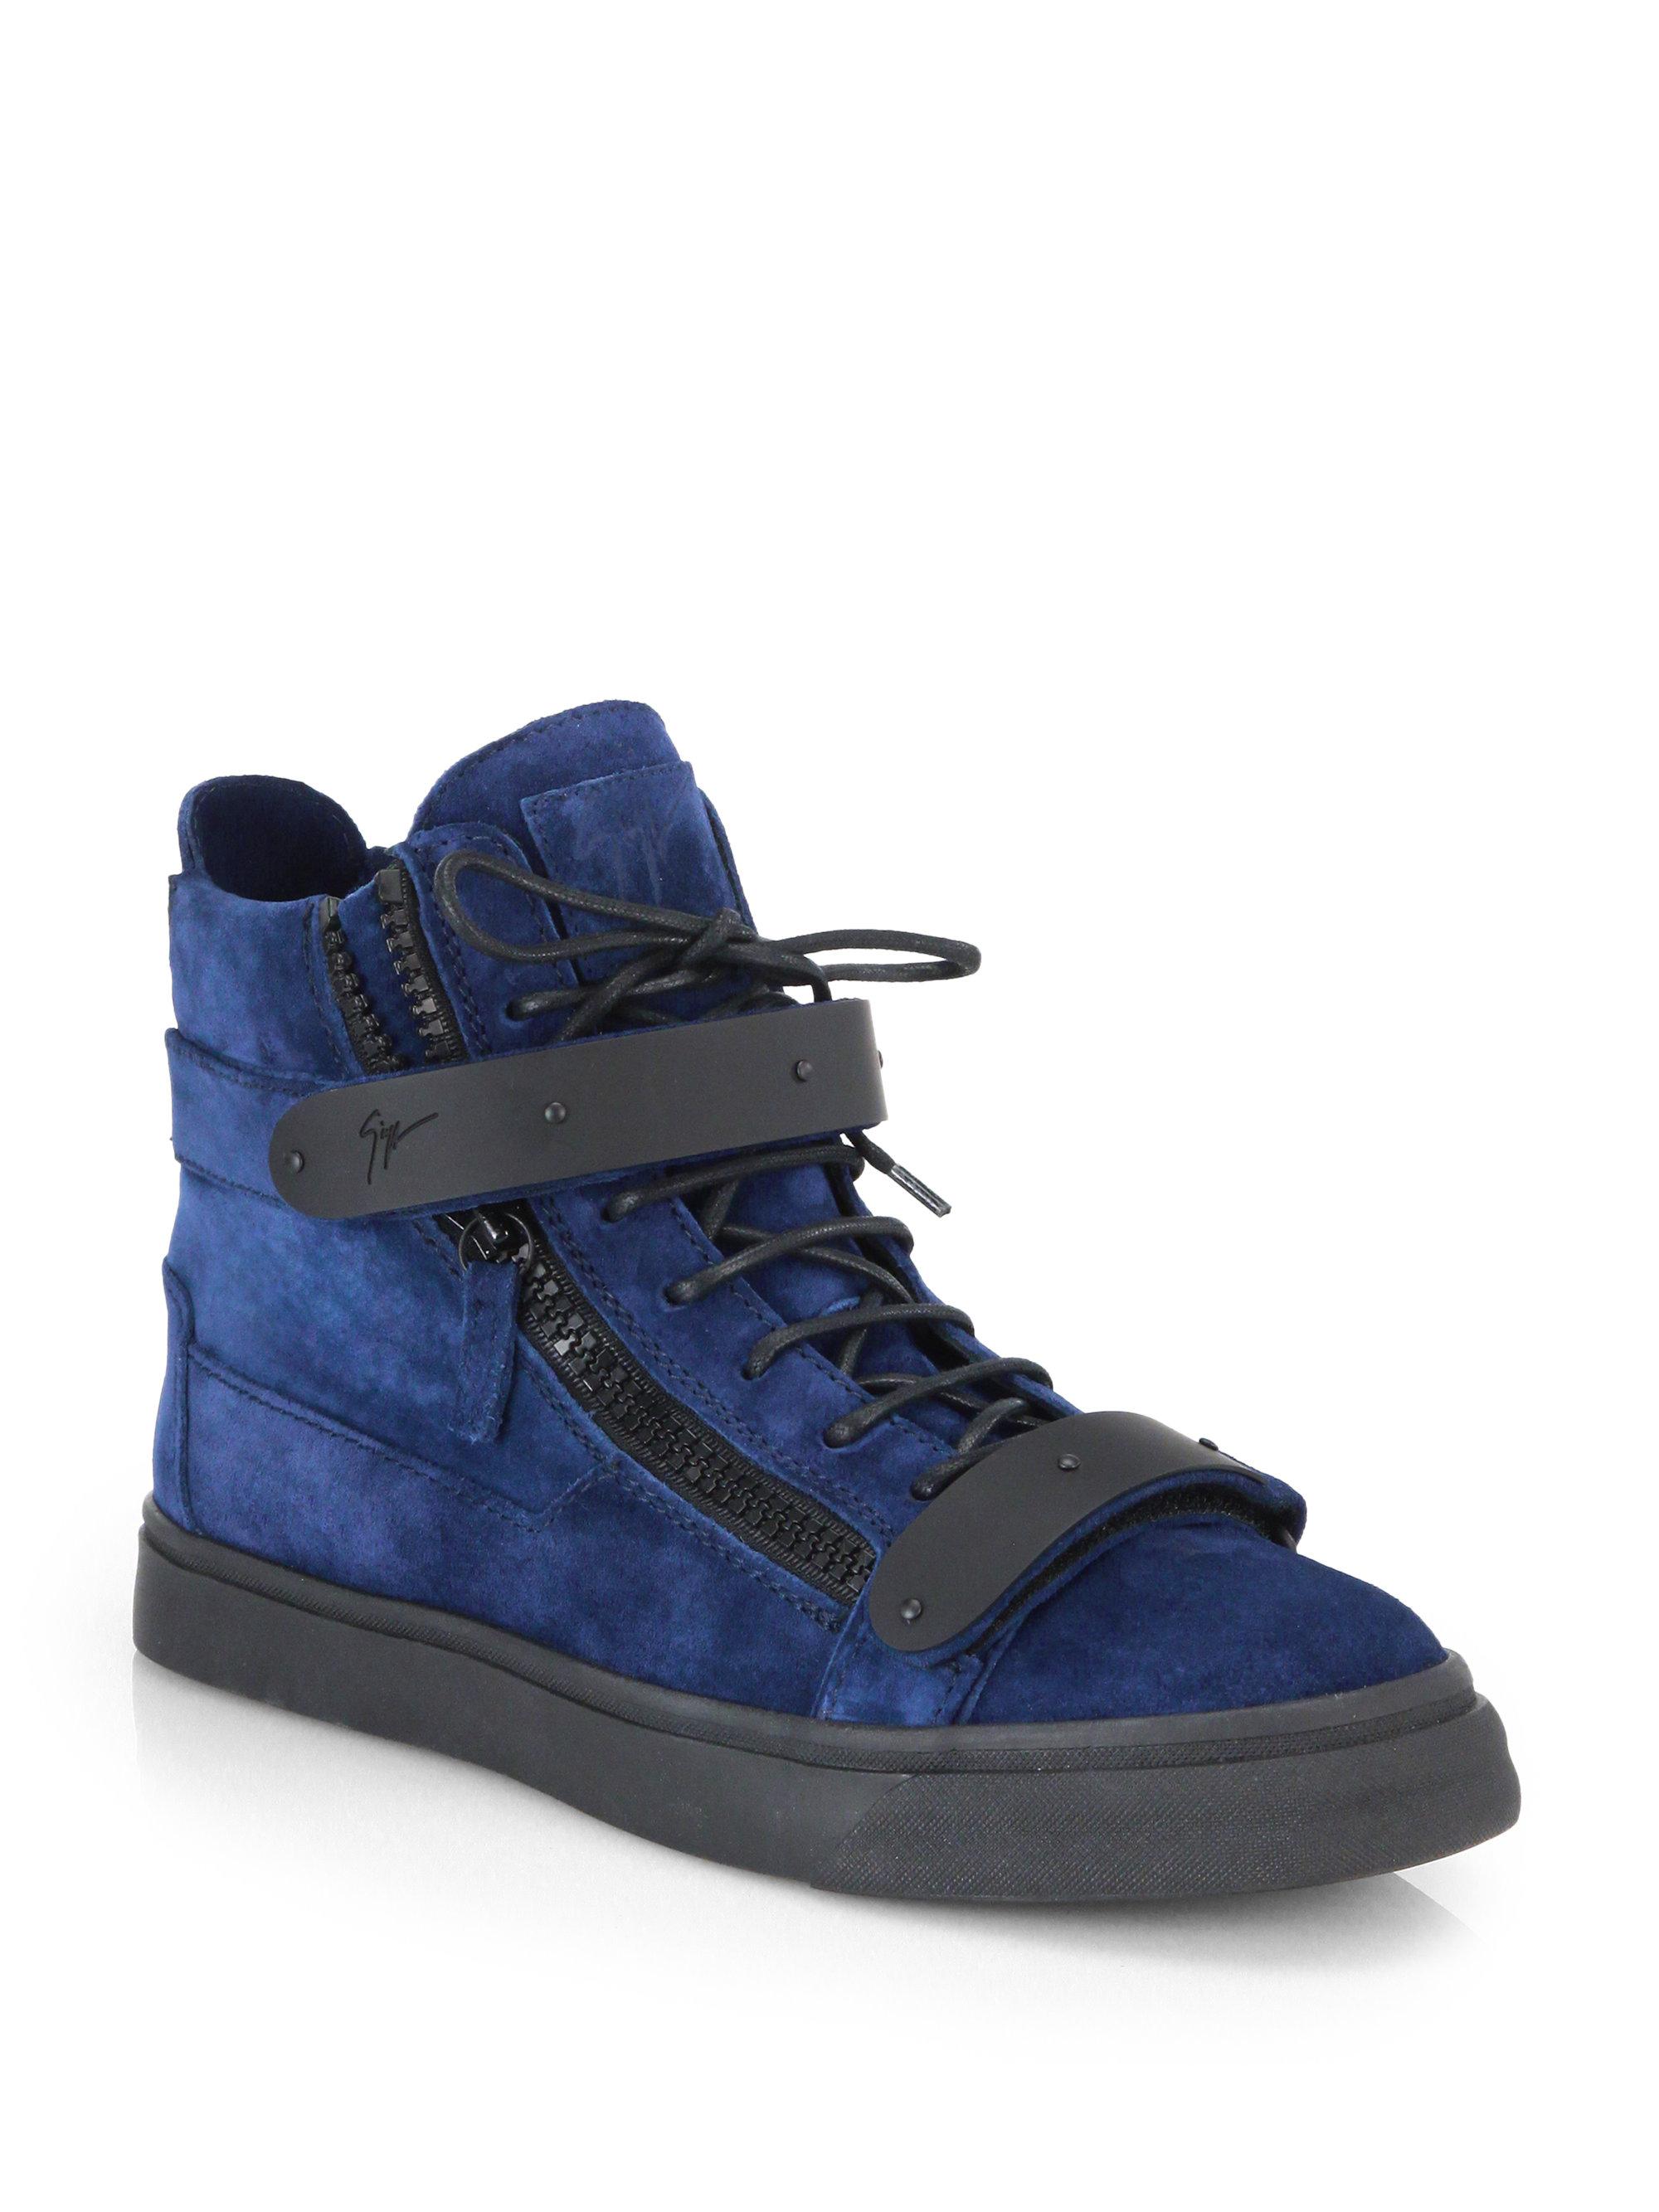 Giuseppe Zanotti Matte Double Bar High Top Sneakers In